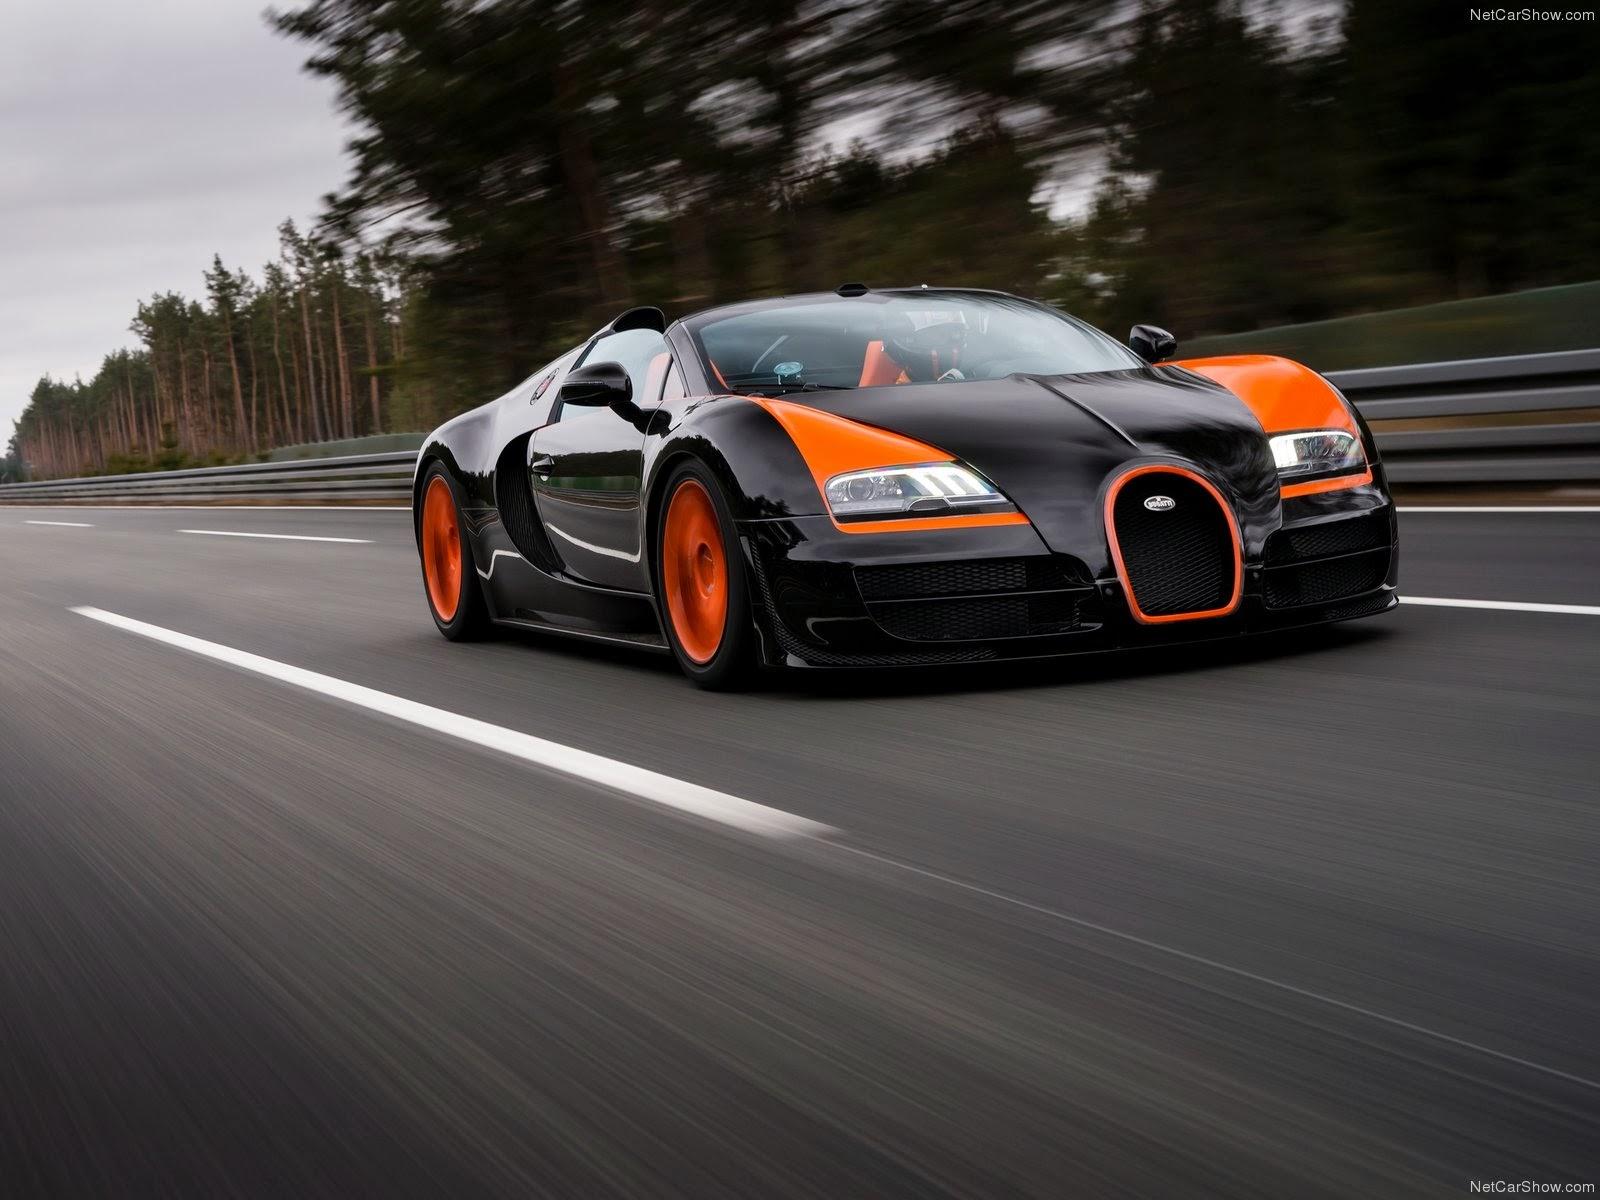 HD Cars Wallpapers: Bugatti Veyron HD Wallpapers